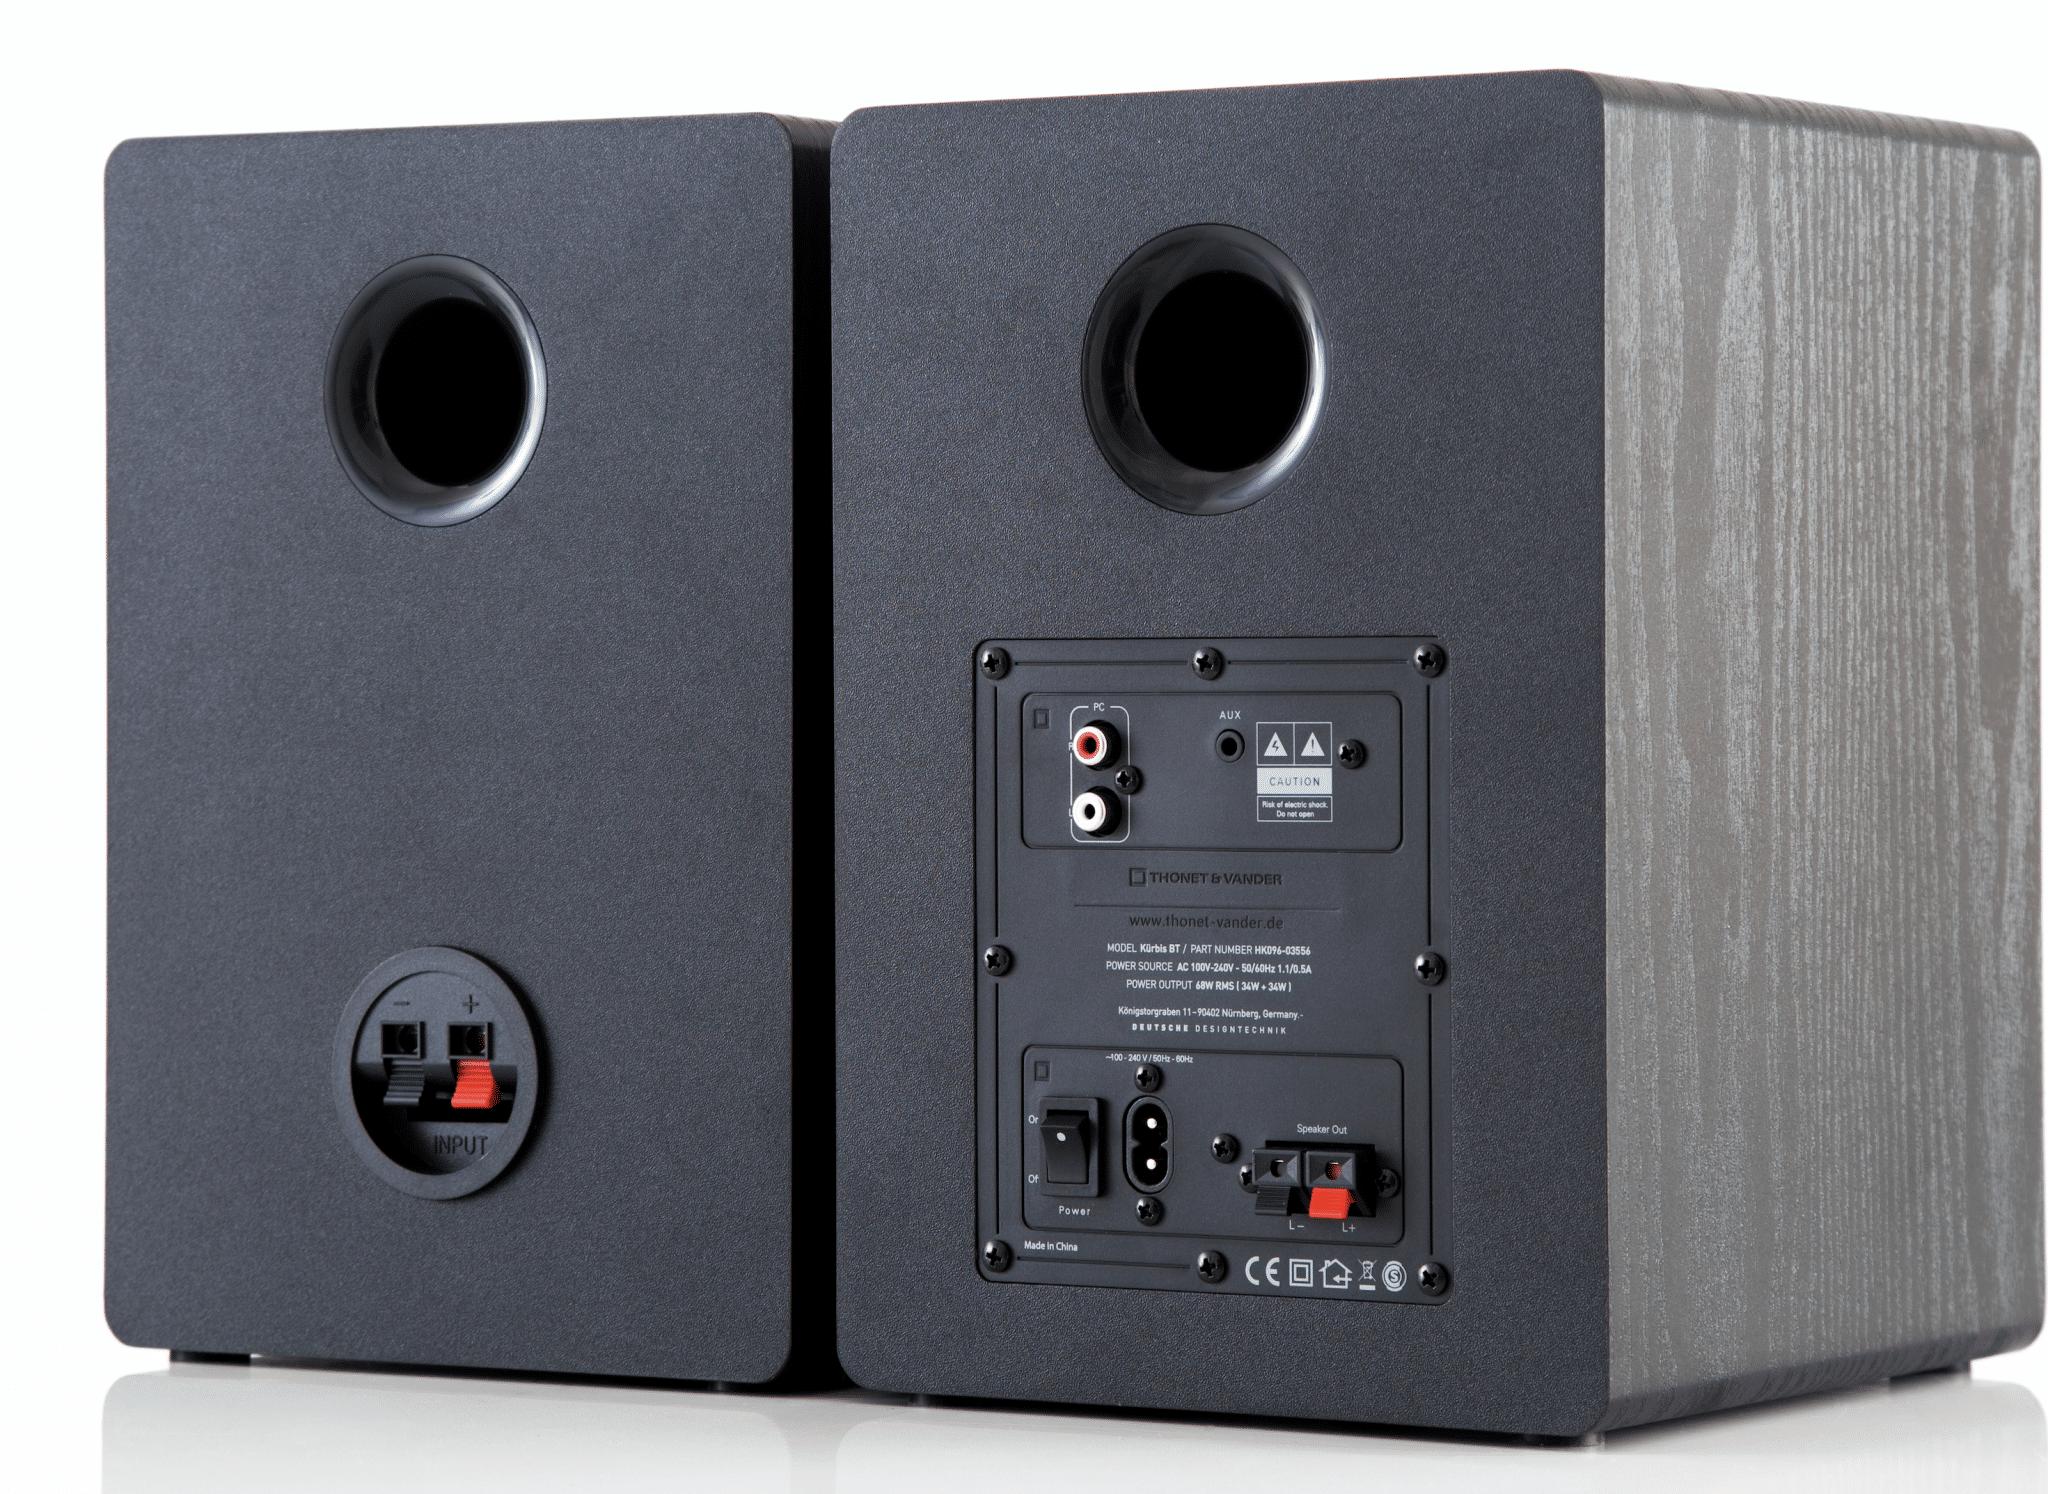 Kurbis Bluetooth Speaker From Thonet & Vander